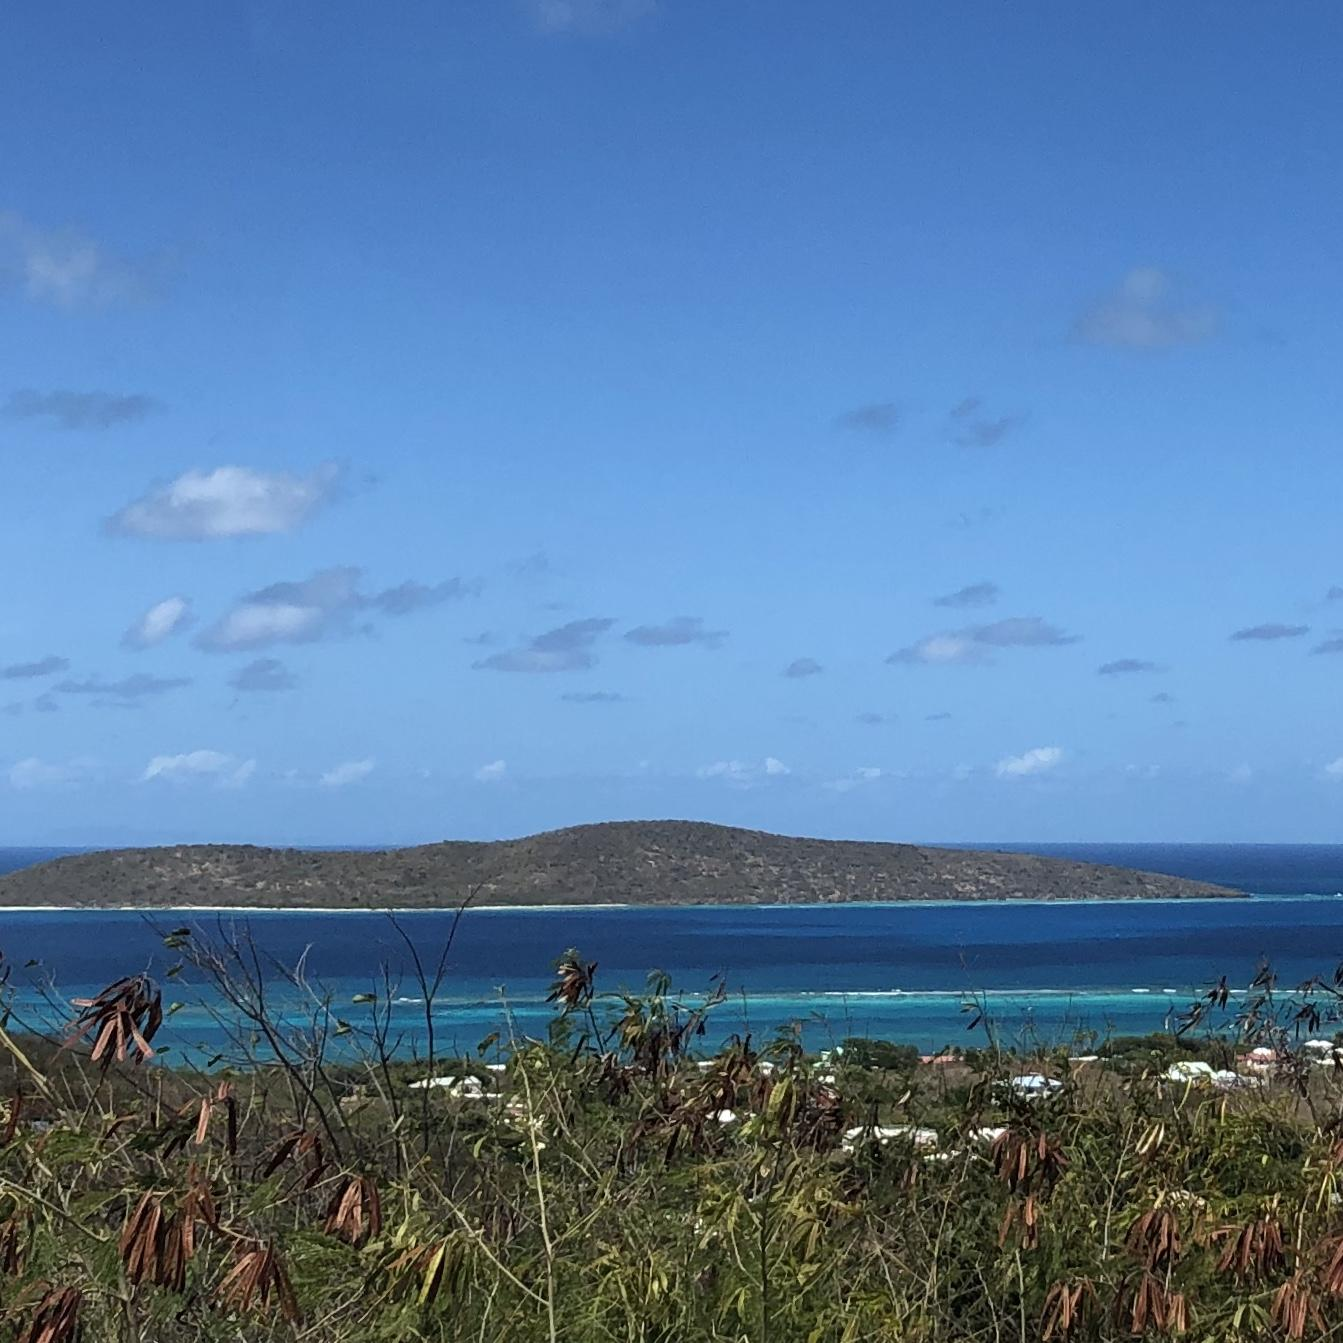 RE/MAX real estate, US Virgin Islands, Hope and Carlton Land Estate, Price Reduced  LotsAcres  Hope  Carton H EB